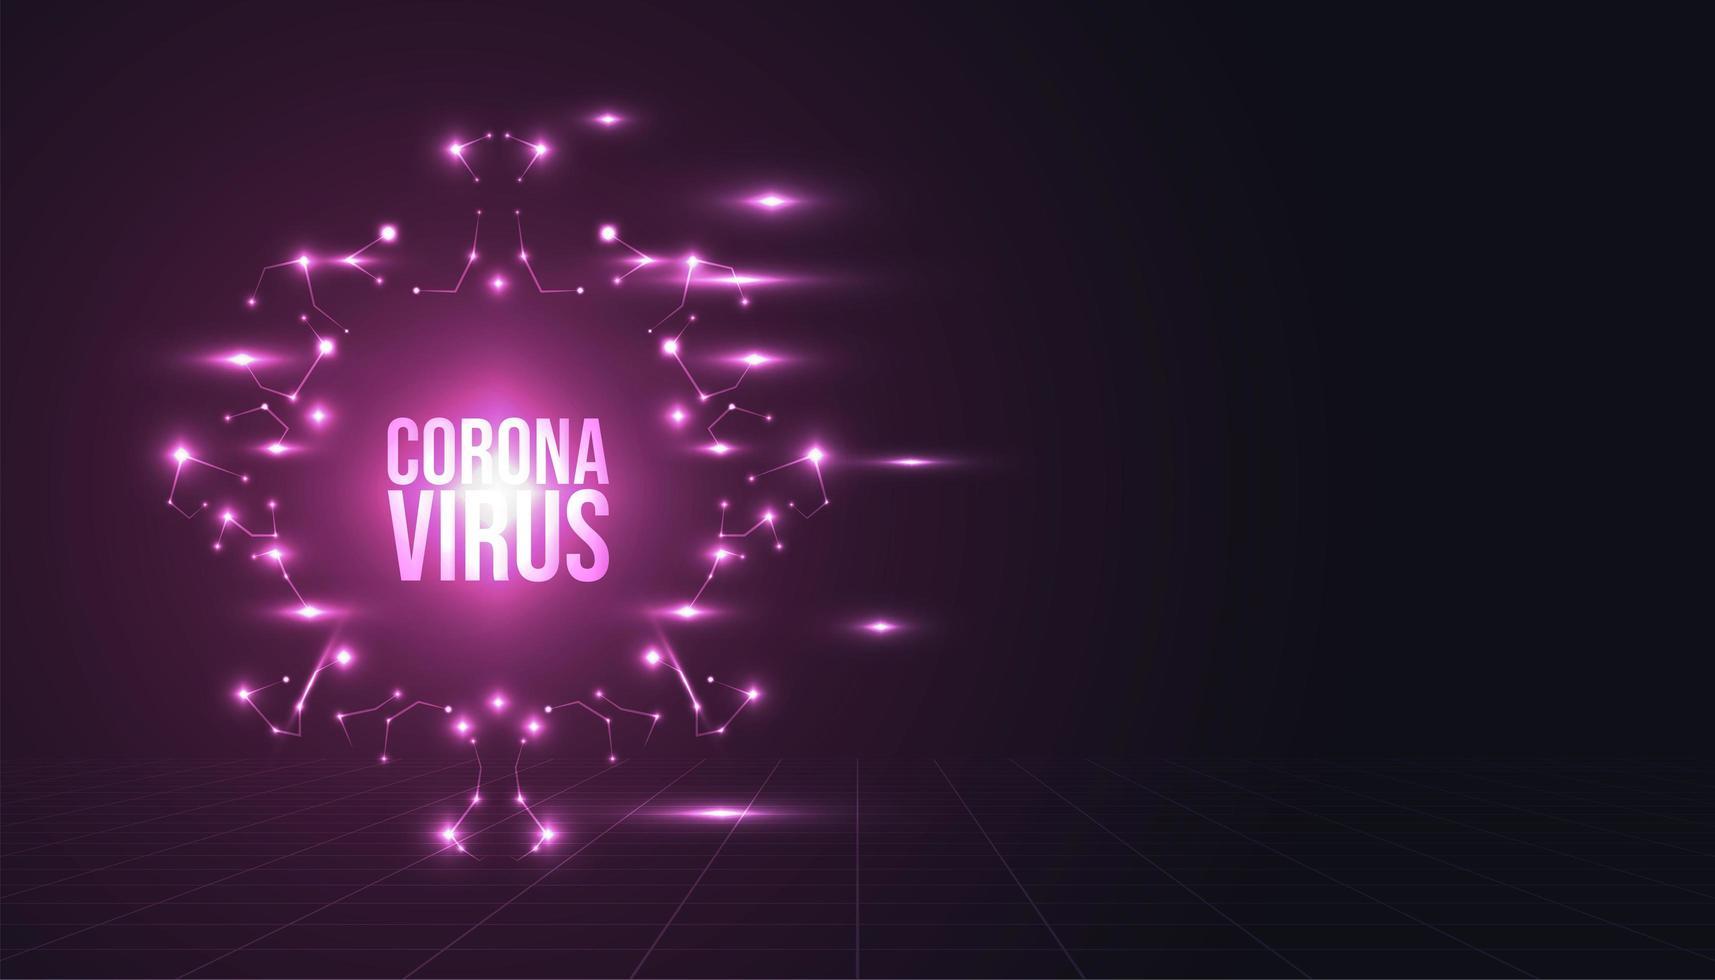 fundo de coronavírus brilhante vetor